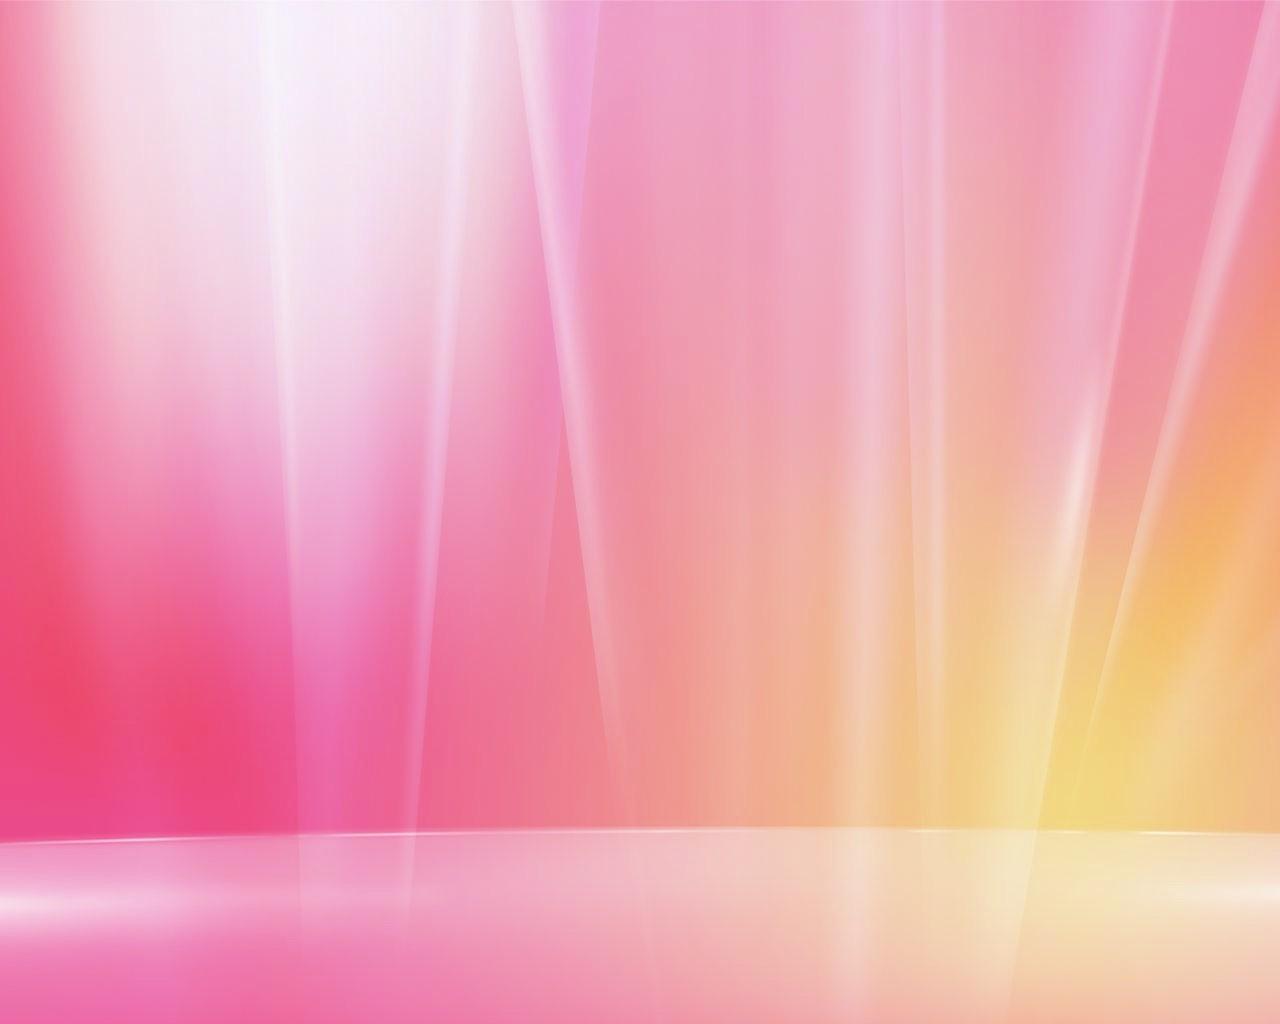 Pink Wallpaper   Pink Color Wallpaper 897928 1280x1024